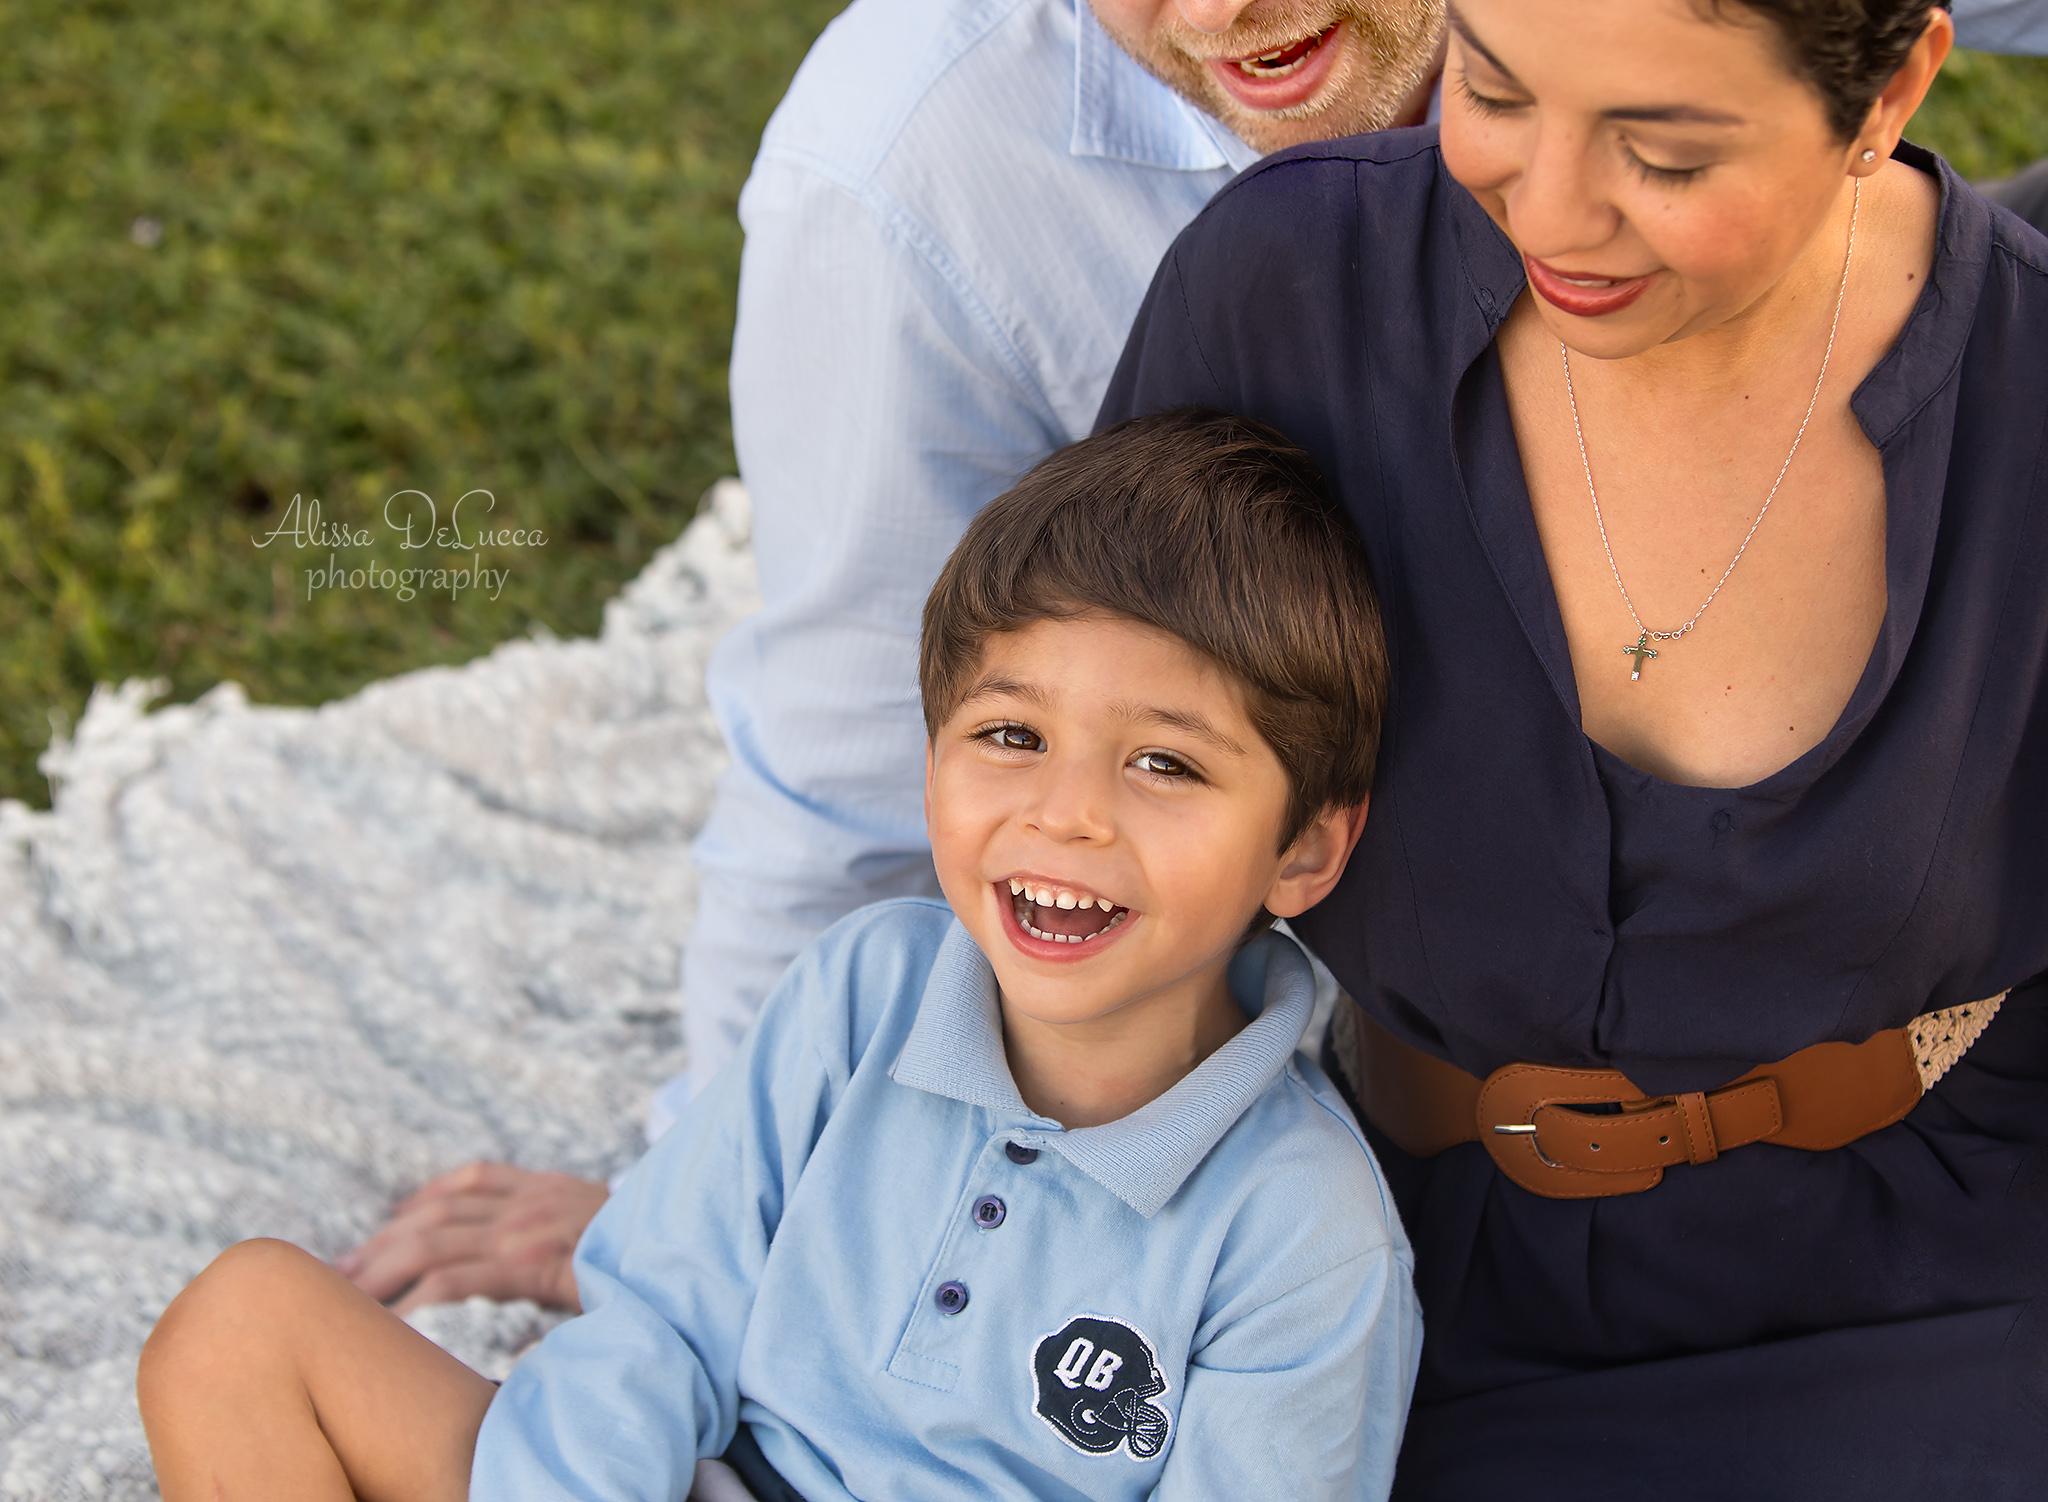 boca-raton-child-photographer-parkland-family-photographer-coral-springs-wellington-lake-worth-boynton-lantana-alissa-delucca-photography-cuddle-boy.jpg